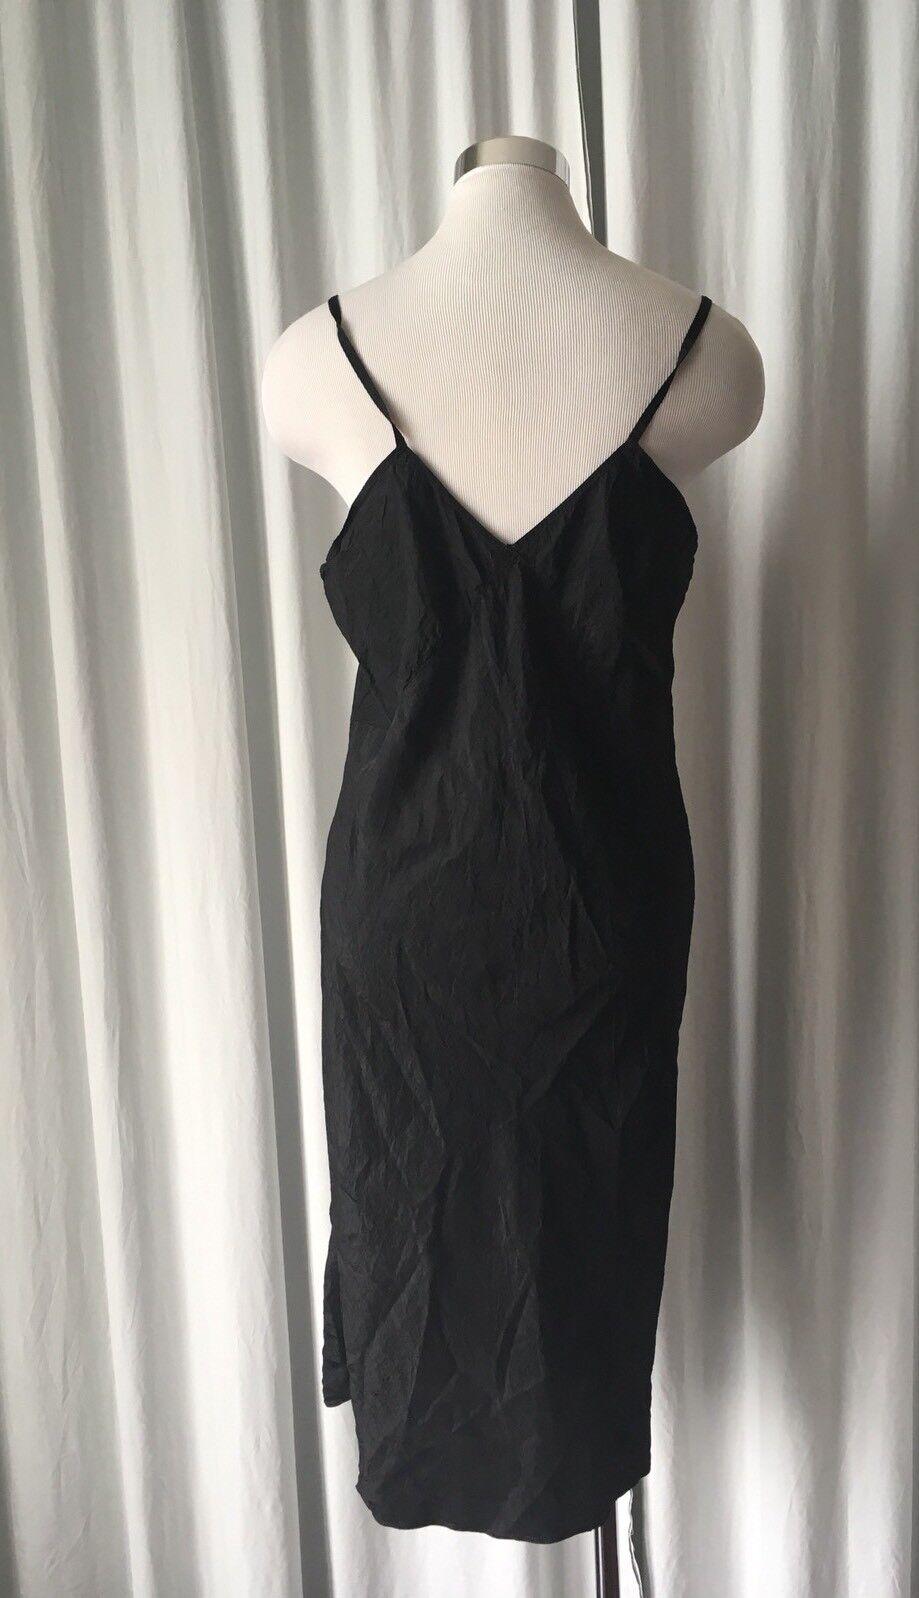 Vintage 40s Black Slip 36/38 - image 4